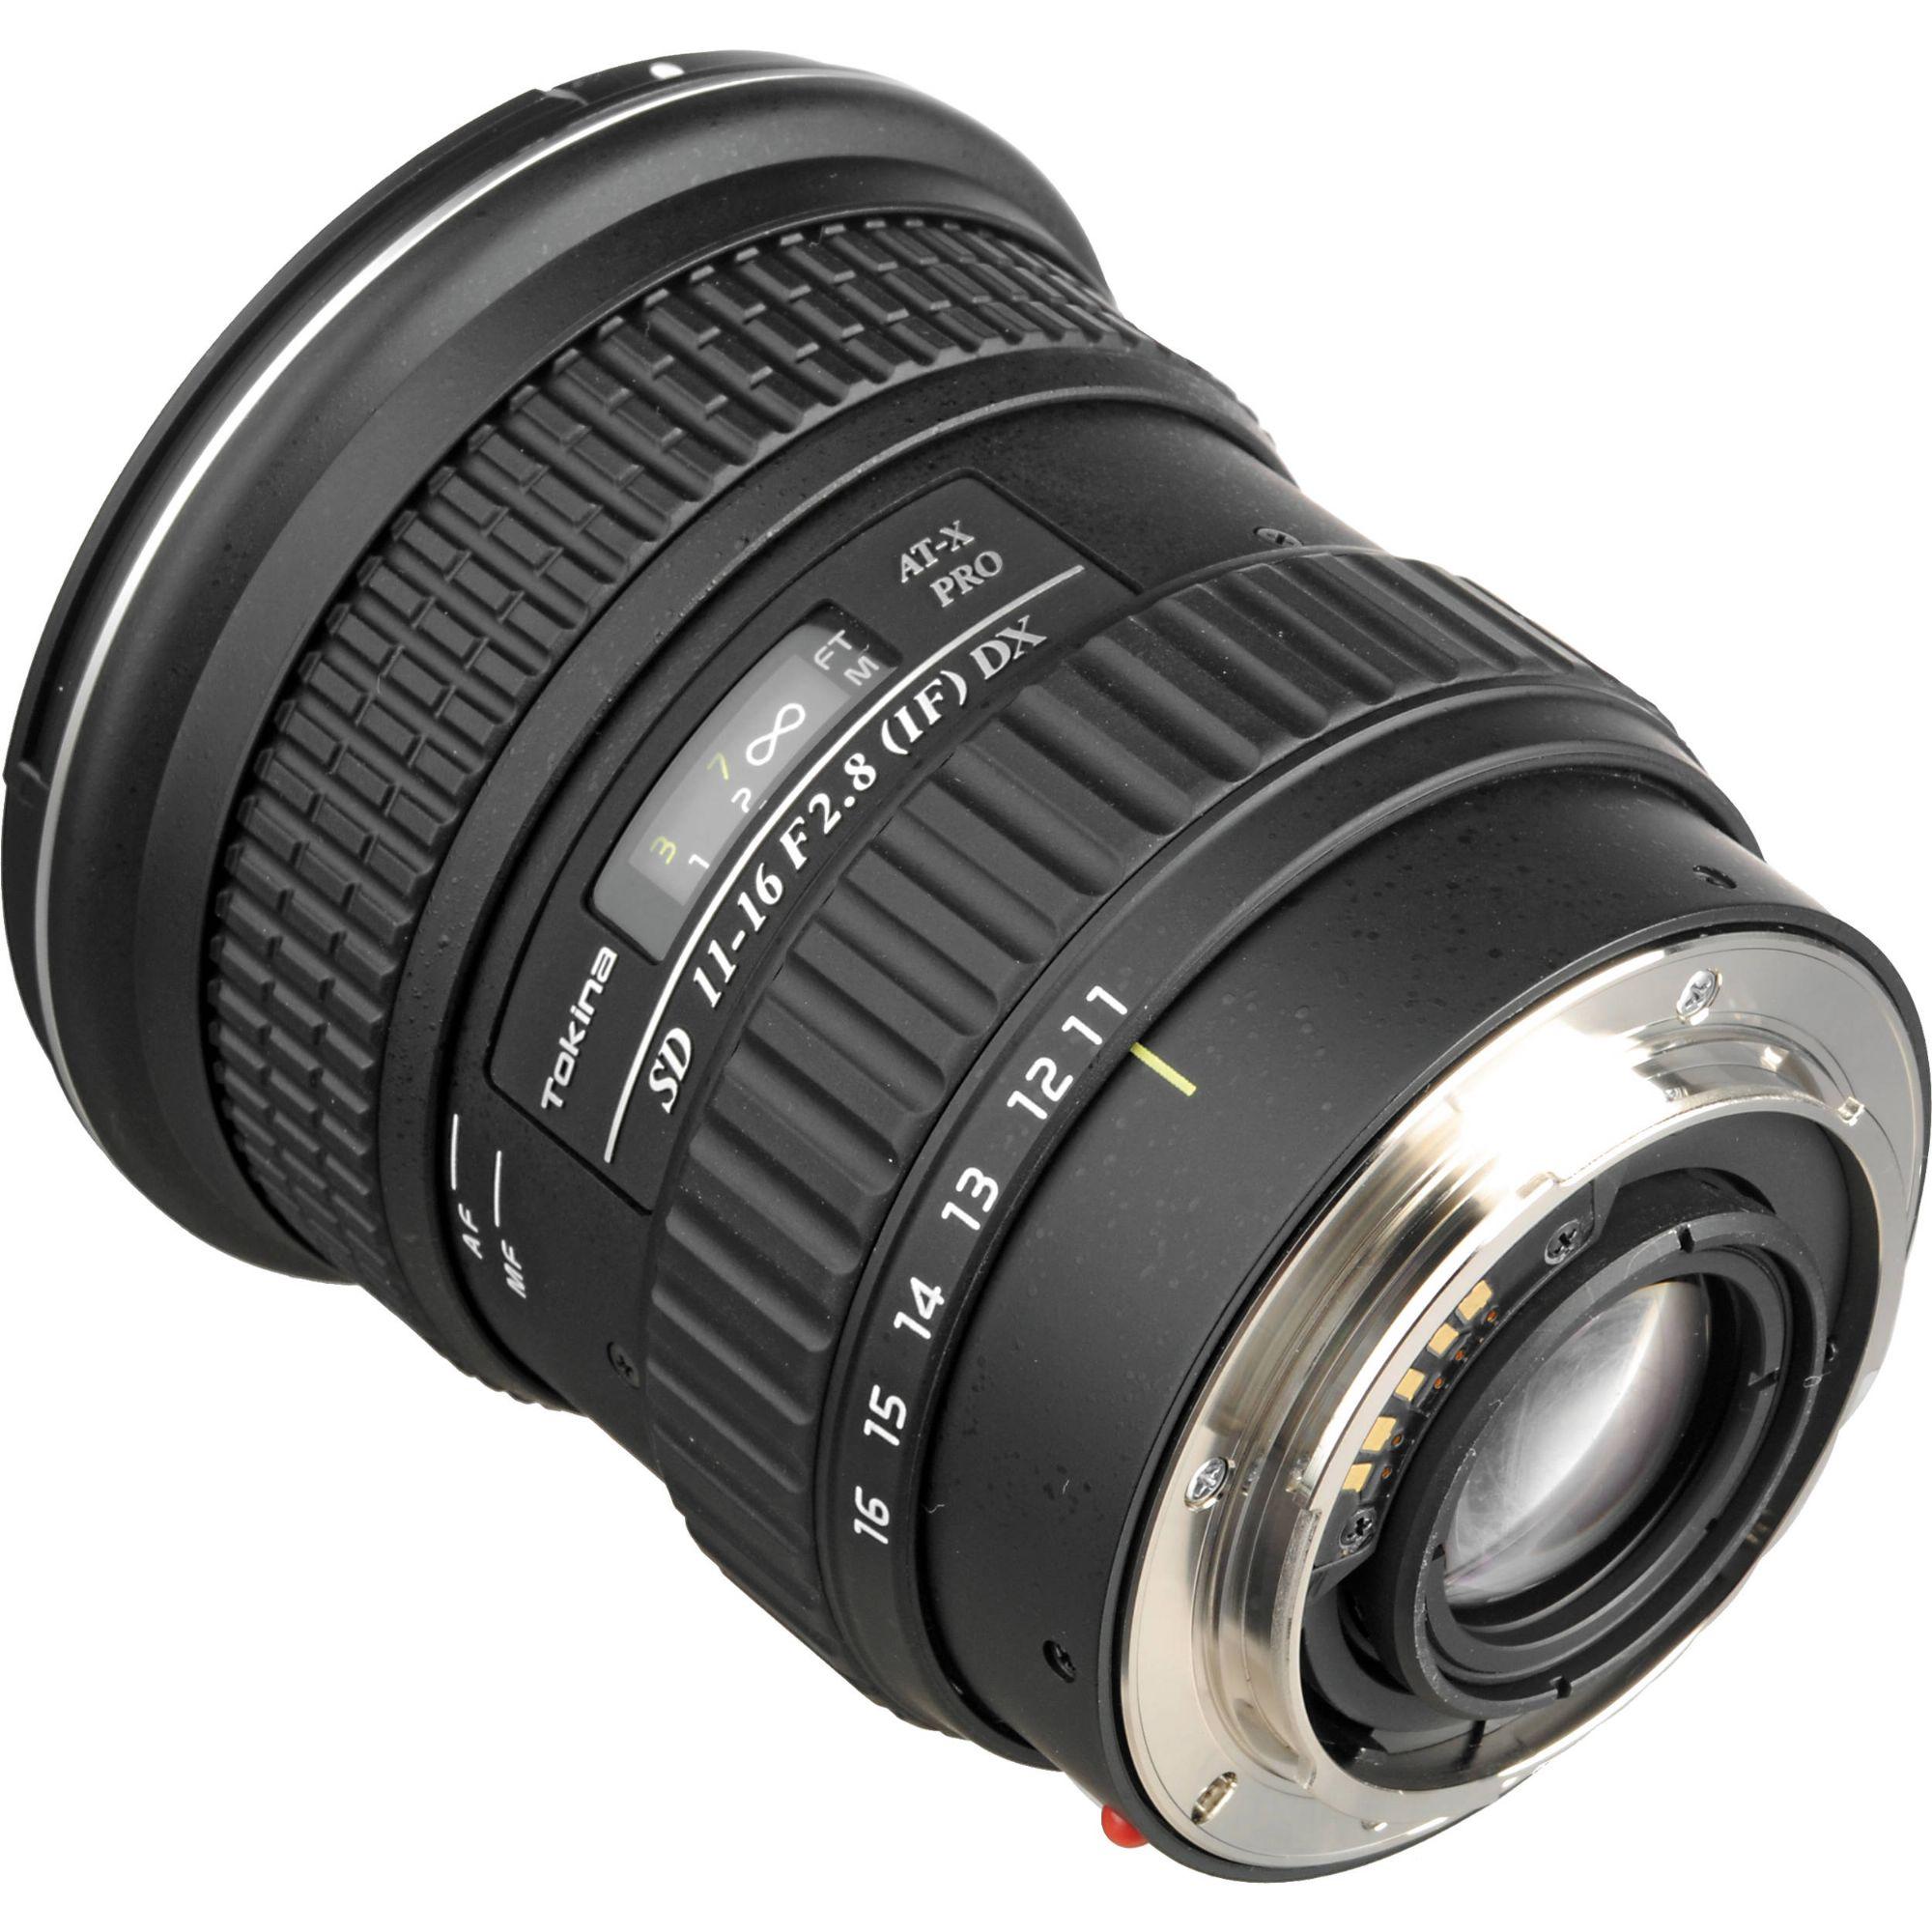 116 2: Tokina 11-16mm F2.8 AT-X 116 PRO DX A-mount Lens Info